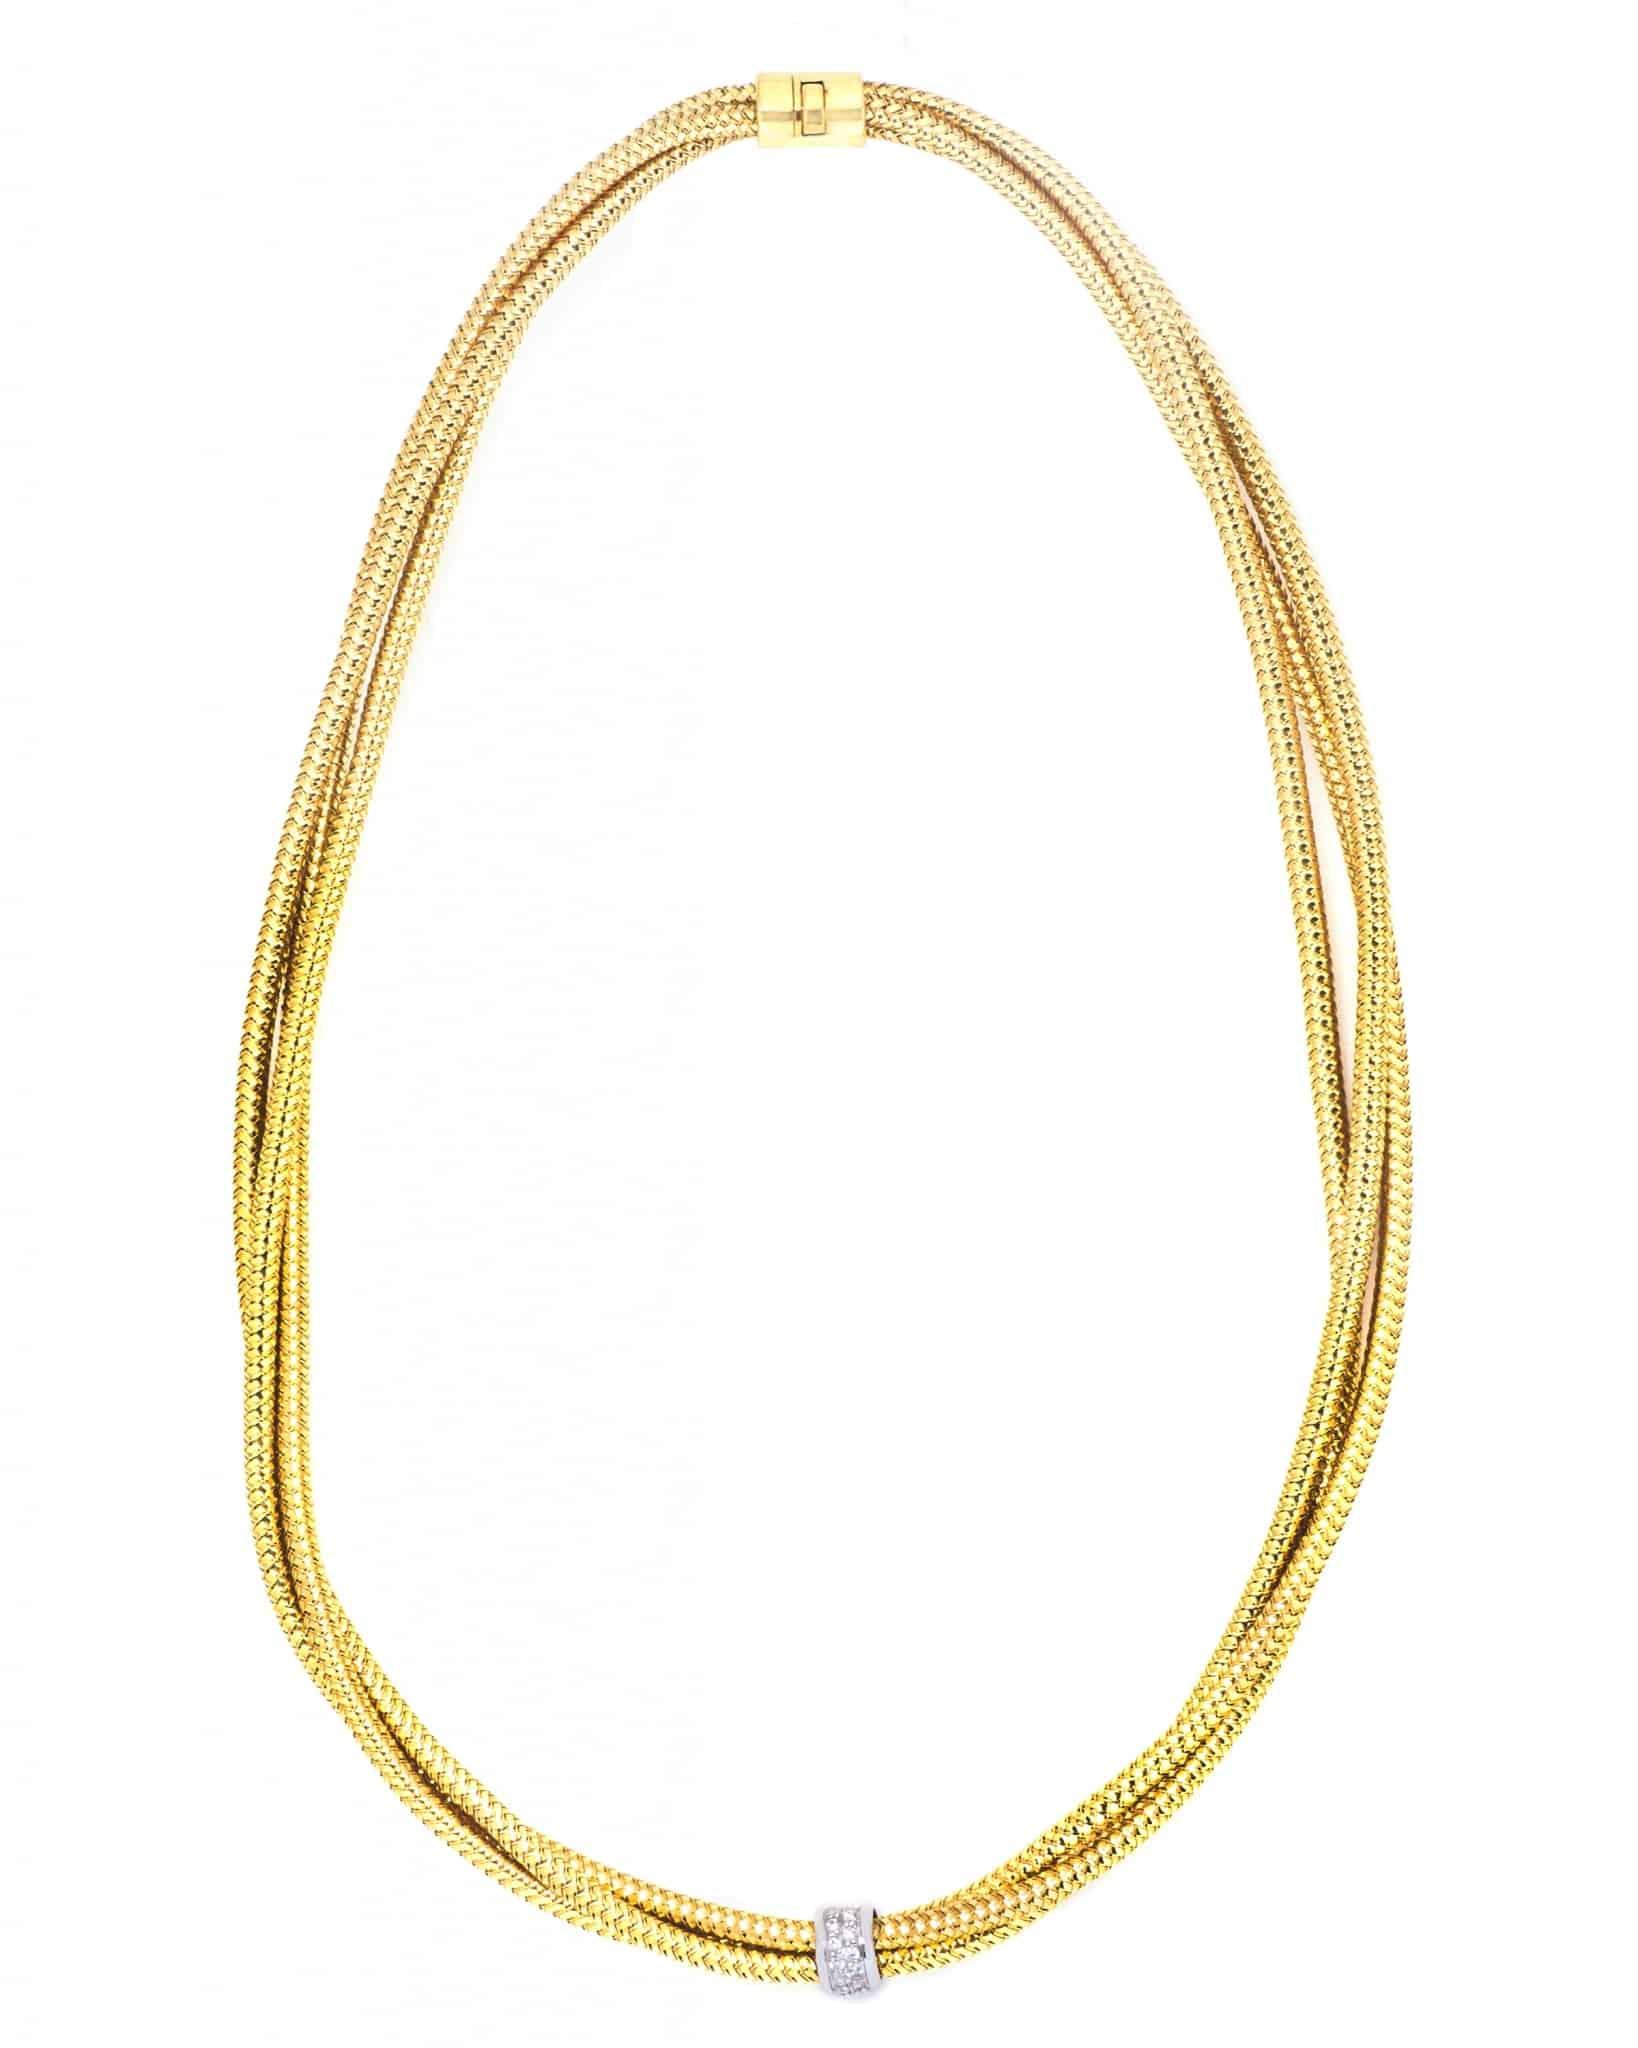 ROBERTO COIN 18K Yellow And White Gold Mesh Necklace Primavera 557378AJCHXO